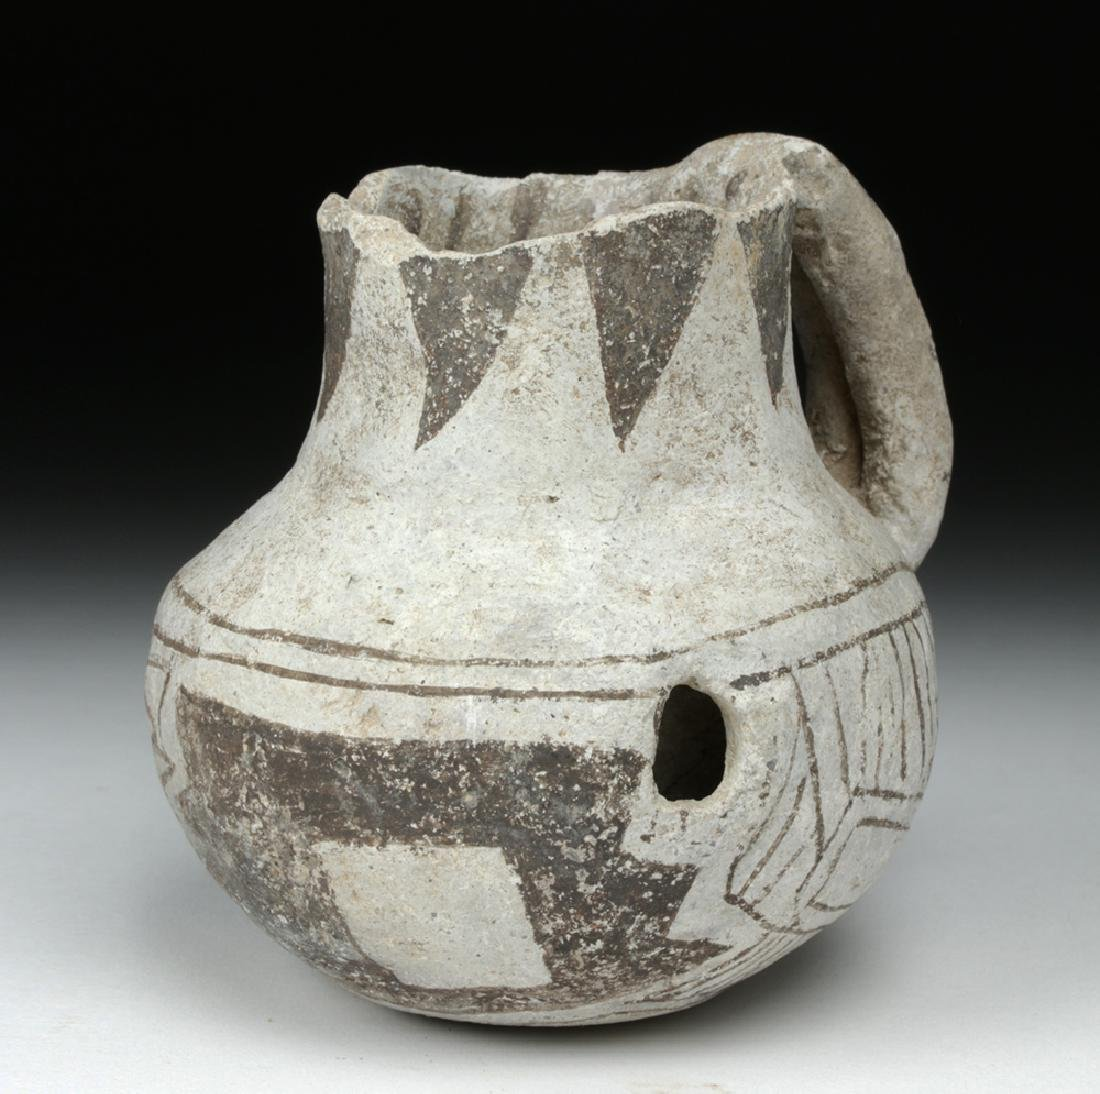 Anasazi Black on White Pottery Dribble Mug